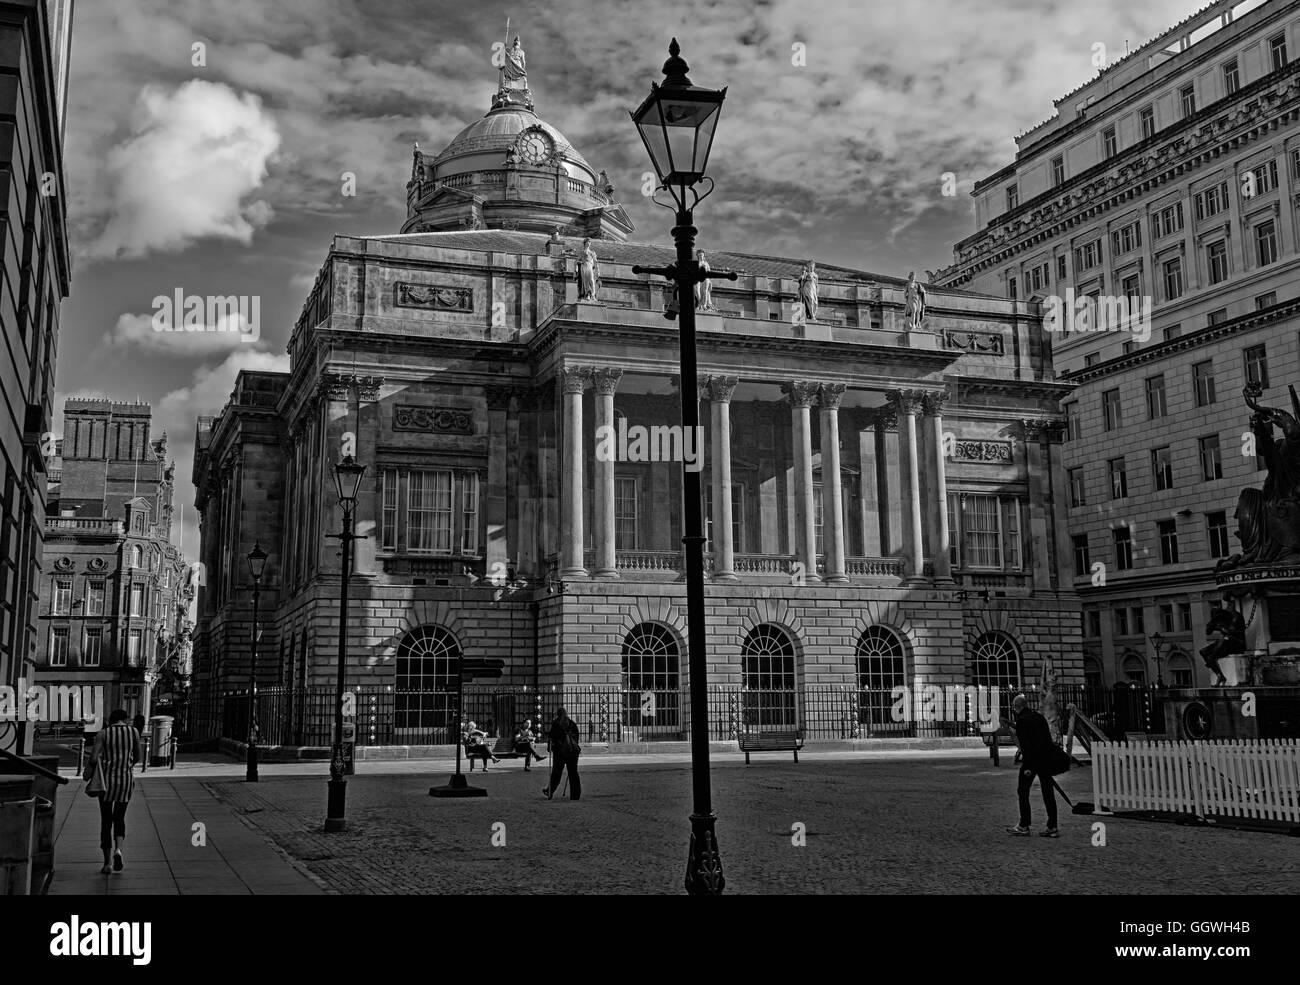 Laden Sie dieses Alamy Stockfoto Liverpool Town Hall, Dale St, Merseyside, England, UK - Mono - GGWH4B